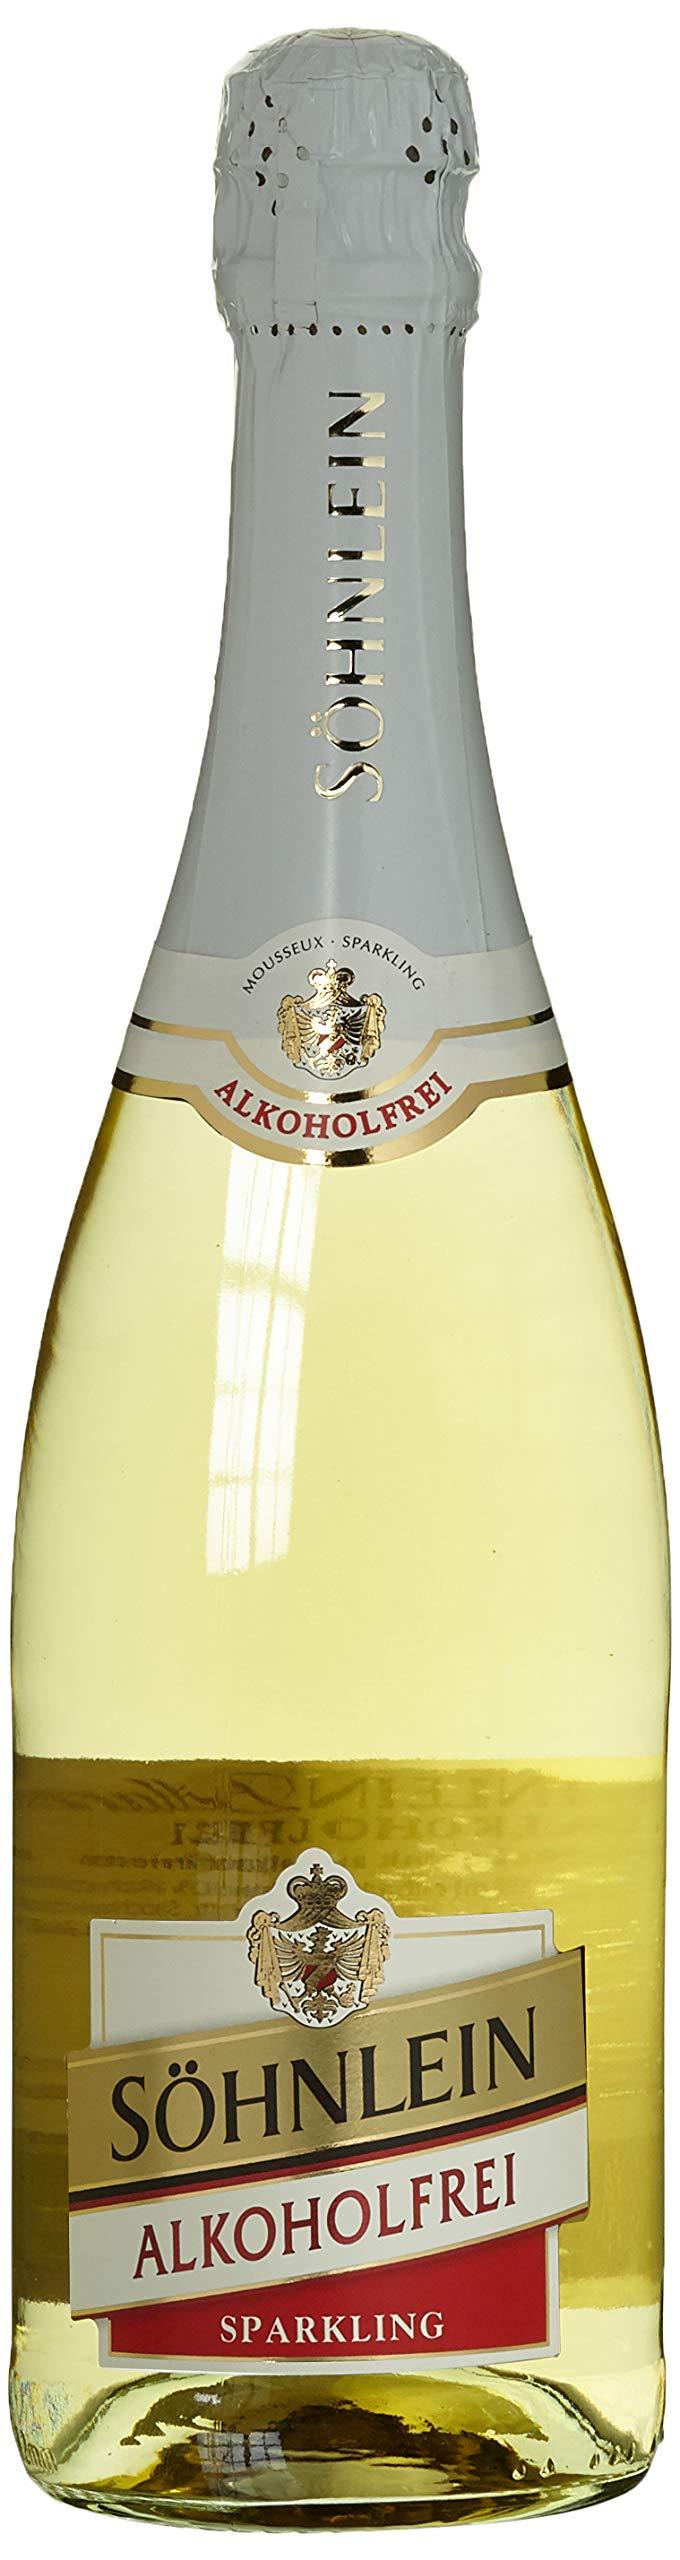 Shnlein-Brillant-Alkoholfrei-Sekt